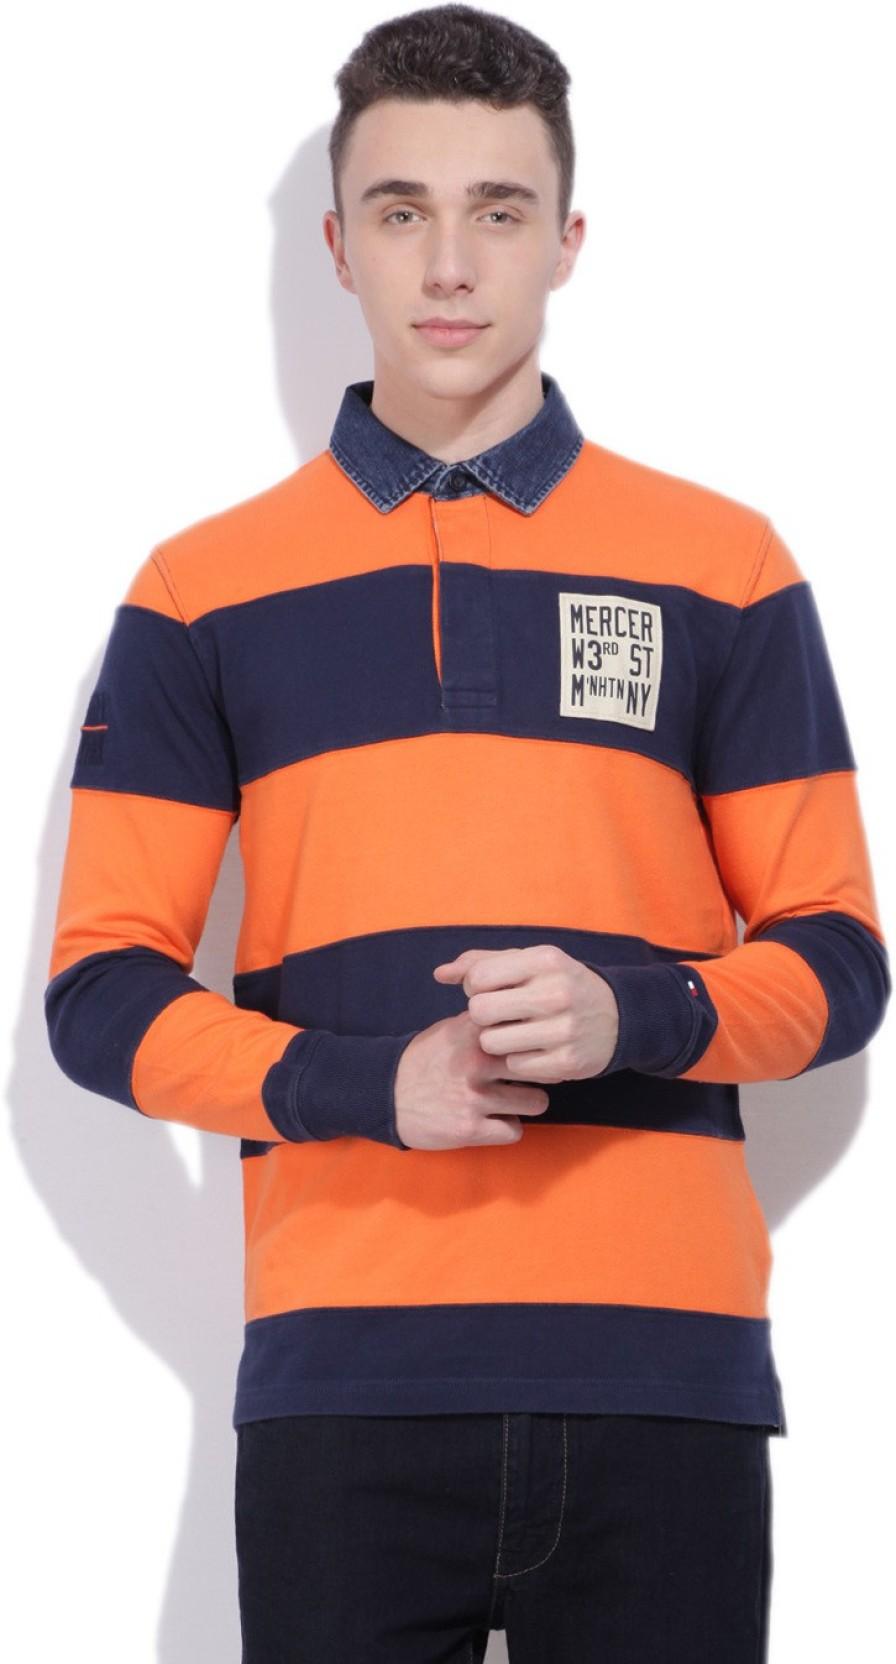 9c99e249 Tommy Hilfiger Striped Men's Polo Neck Orange, Blue T-Shirt - Buy ...